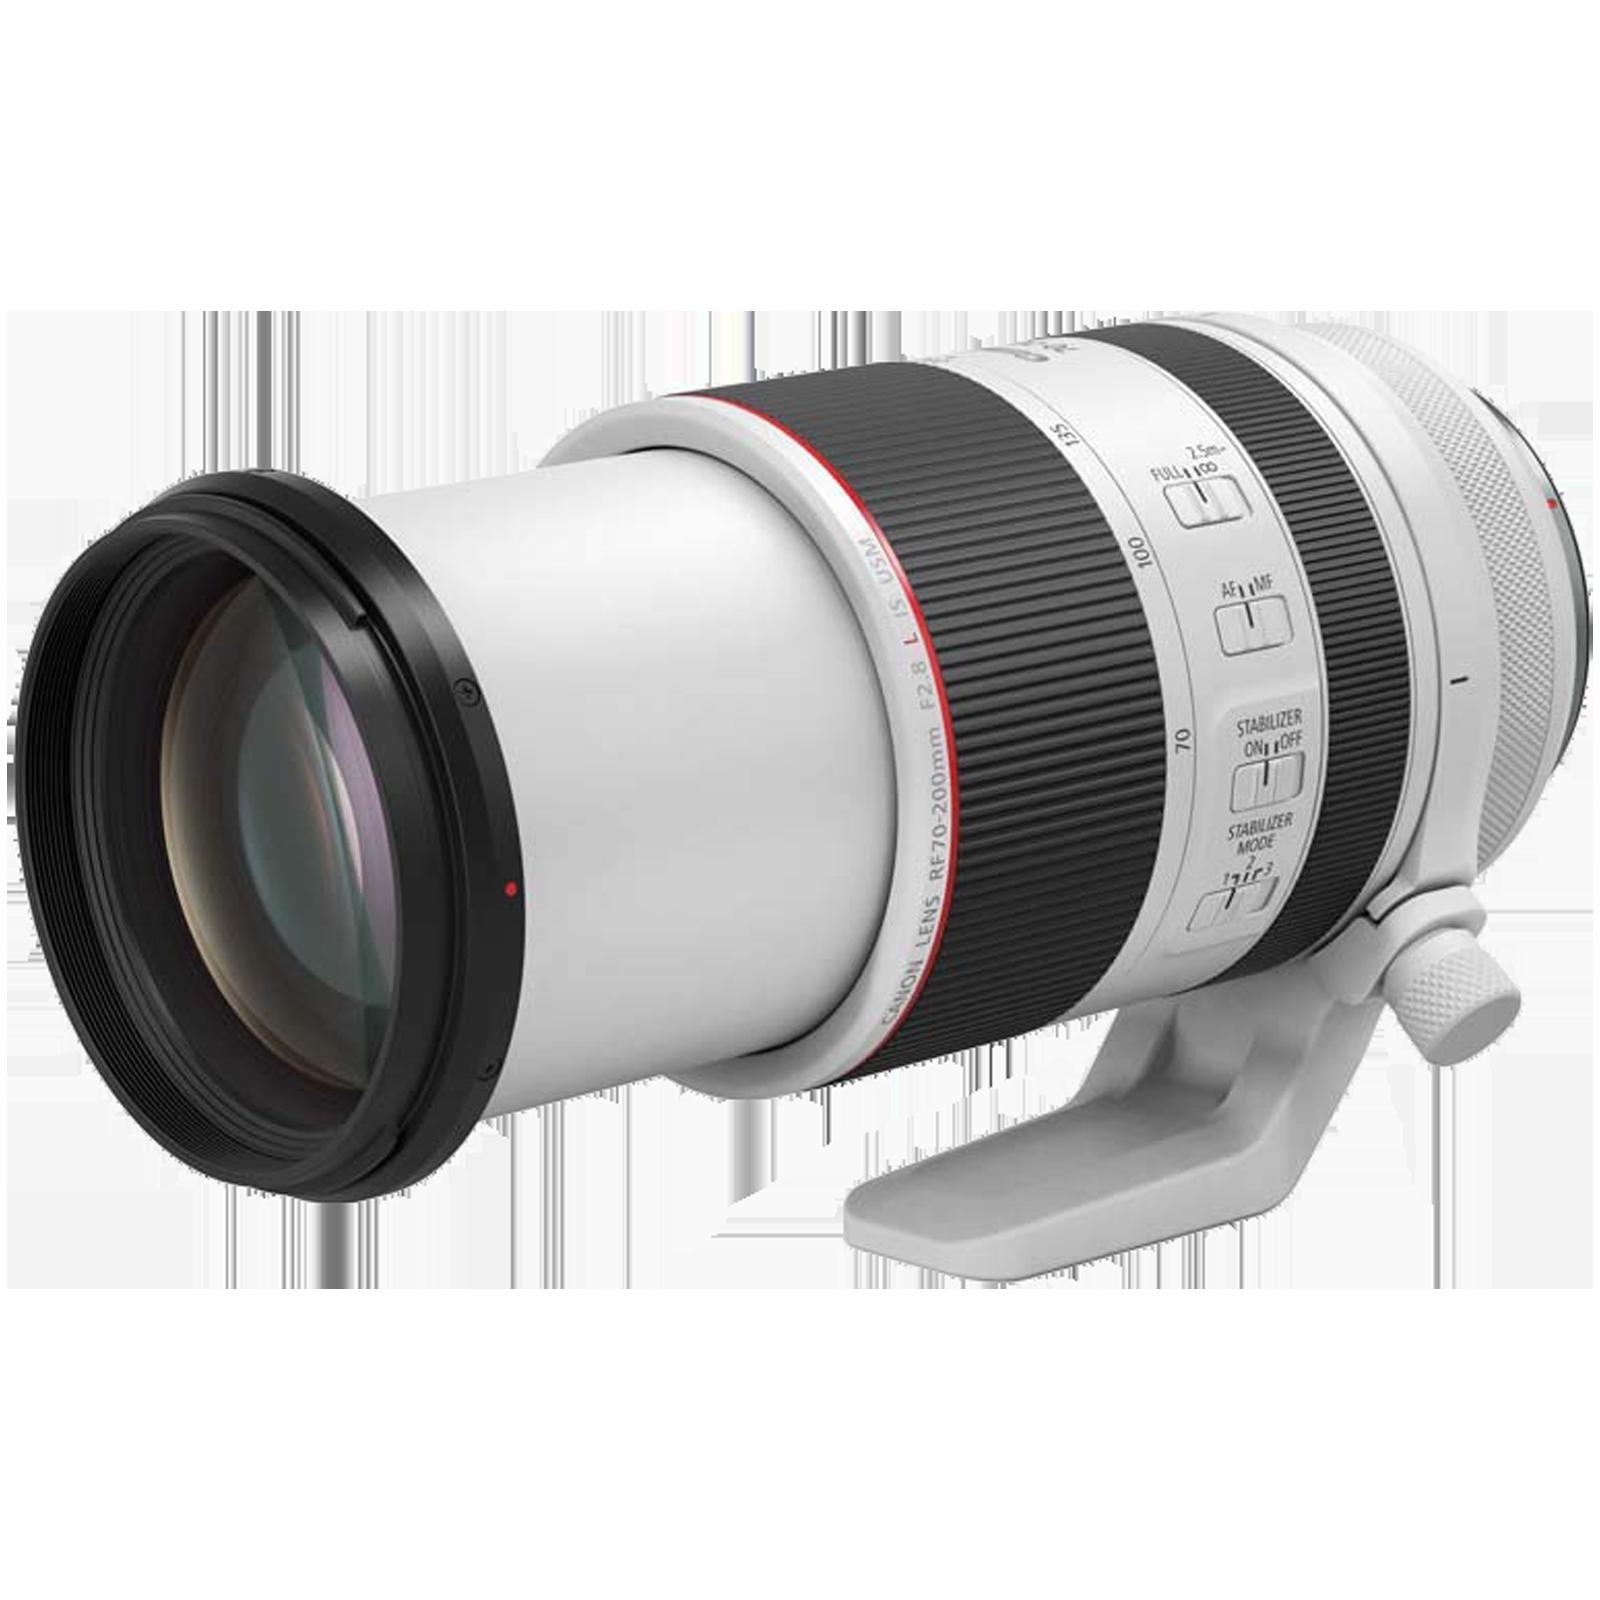 Canon RF 70 - 200 mm f/2.8L Telephoto Lens (Dual Nano USM, 3792C003AA, Black)_1